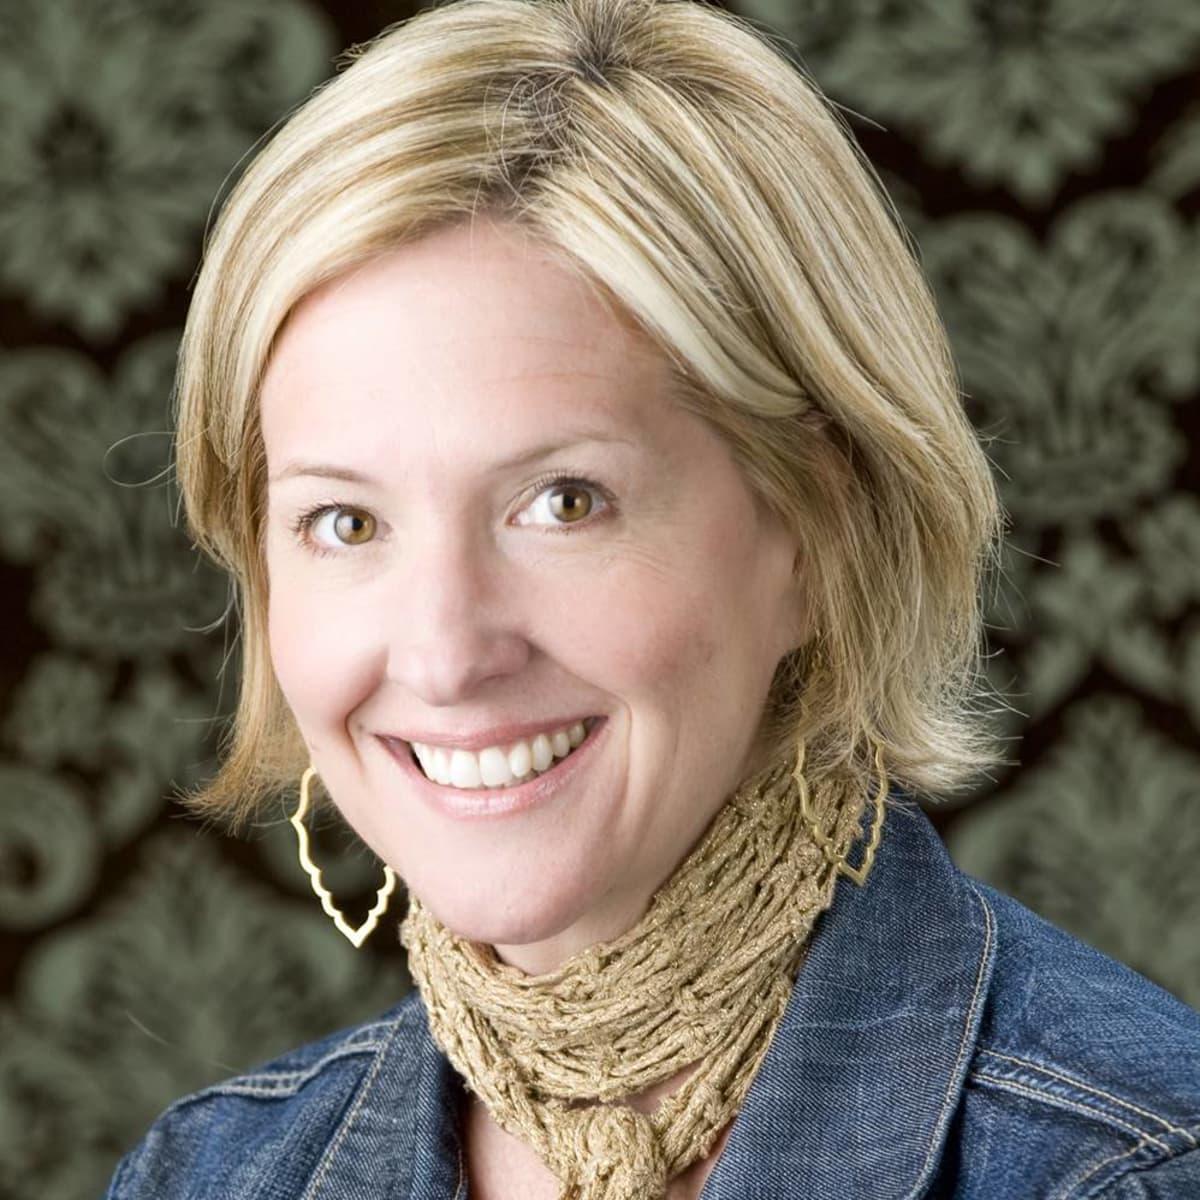 Austin Photo Set: News_Caitlin_dr. brene brown_oct 2012_portrait